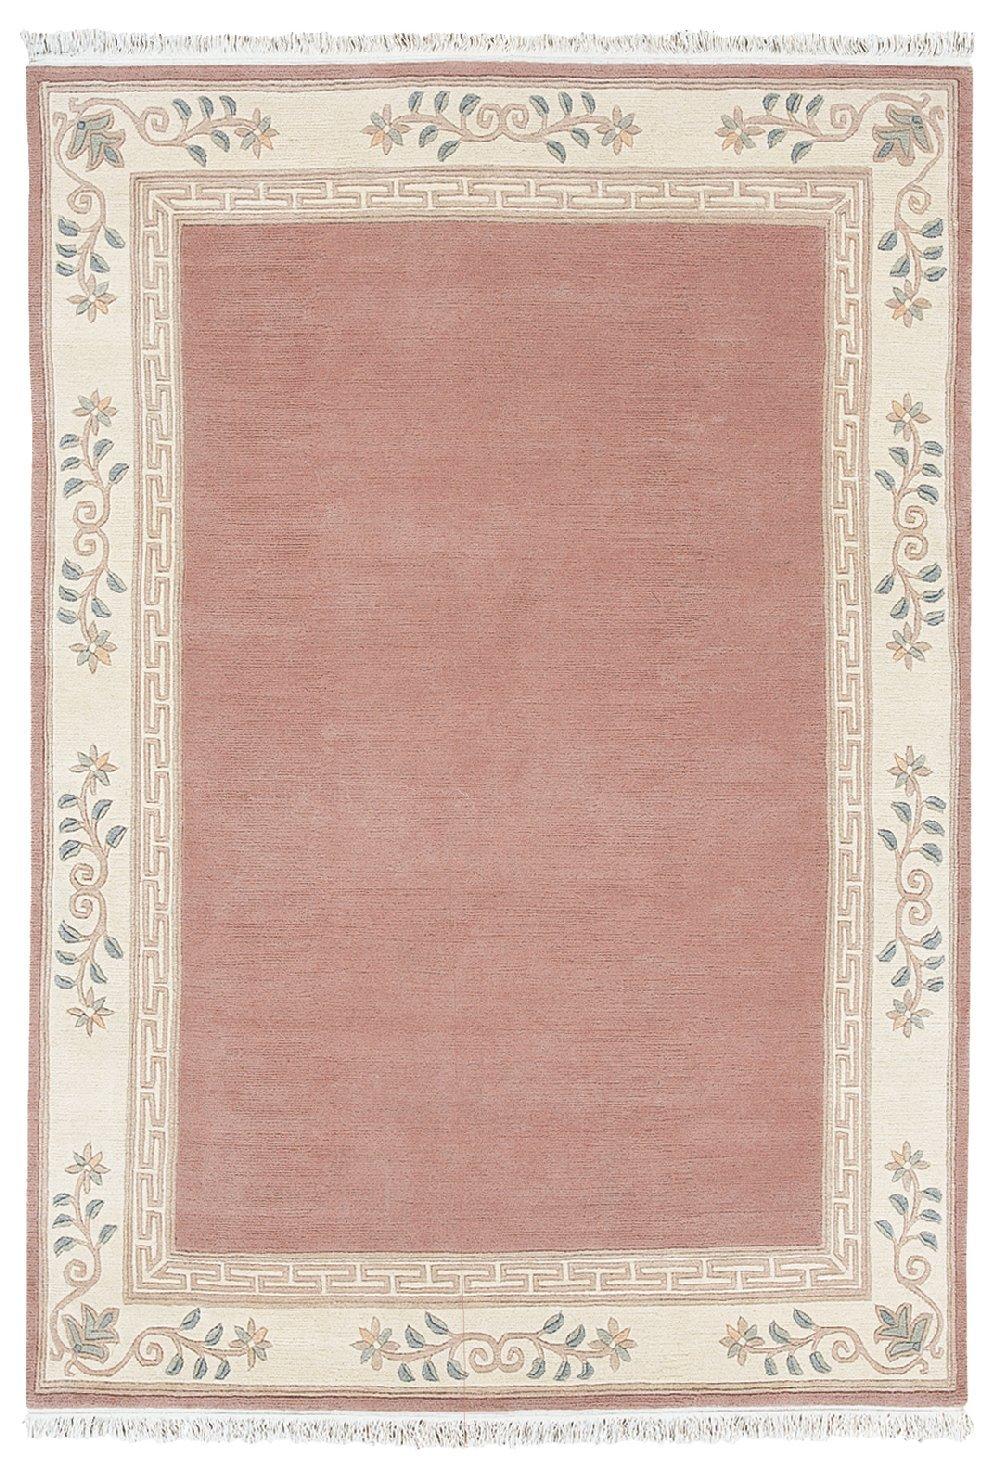 Sona-Lux Nepal Teppich handgeknüpft altrose